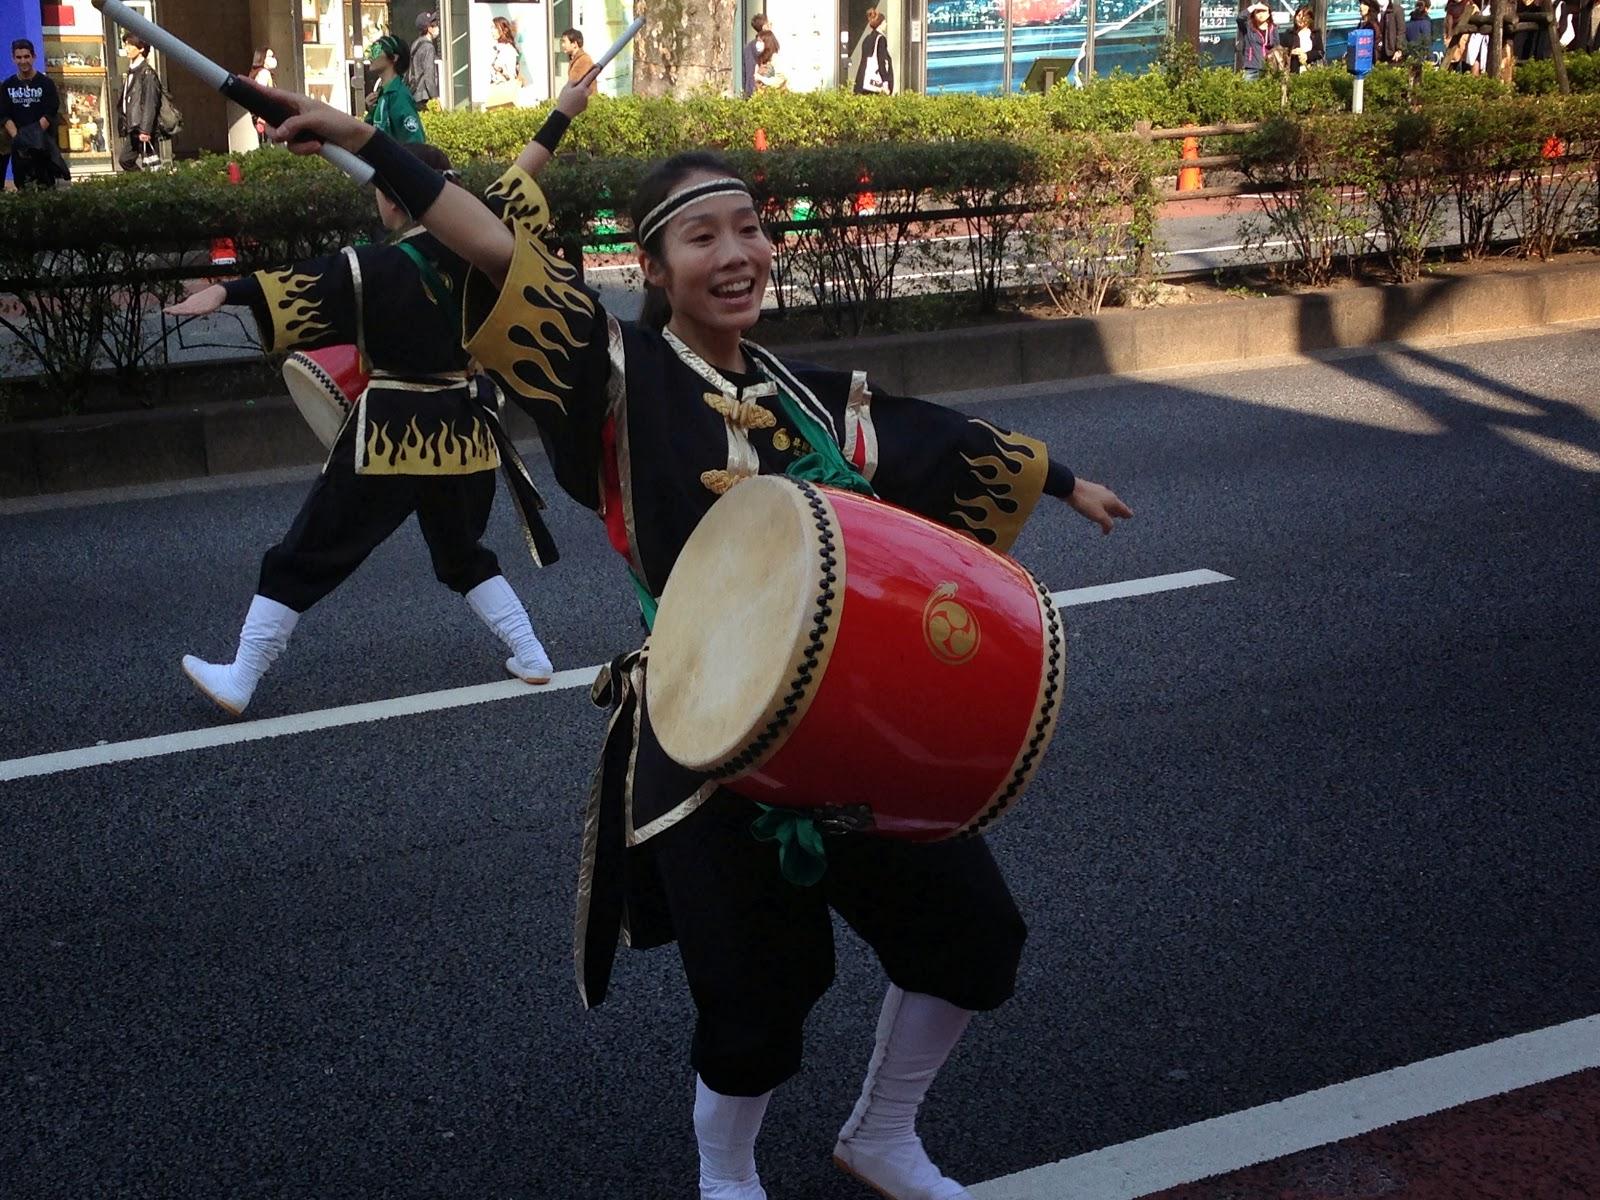 "<a href=""http://vionm.com/"">Thailand</a> <a href=""http://vionm.com/things-to-do-in-bangkok-thailand/thailandhoneymoon-explore-the-beauty-of-koh-samui/"">Beach</a>: A Japanese St. Patrick's 24-Hour Interval Parade!"